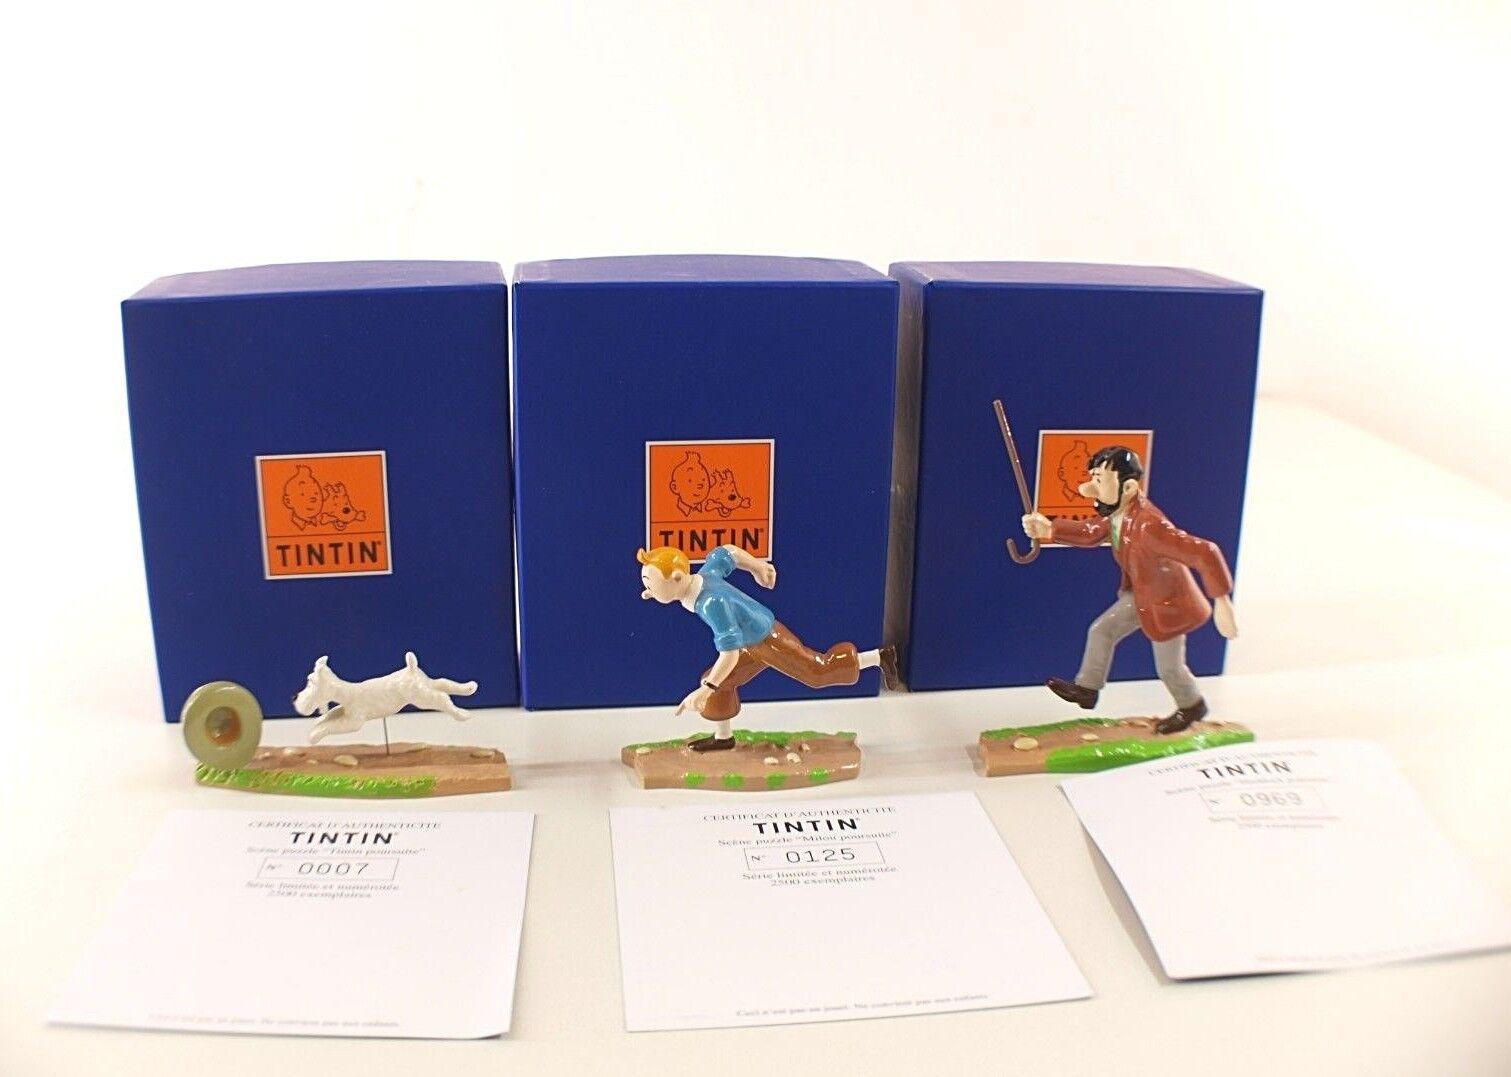 Pixi n° 46937 8 9 Haddock Tintin Milou Poursuite boite azule moulinsart Hergé